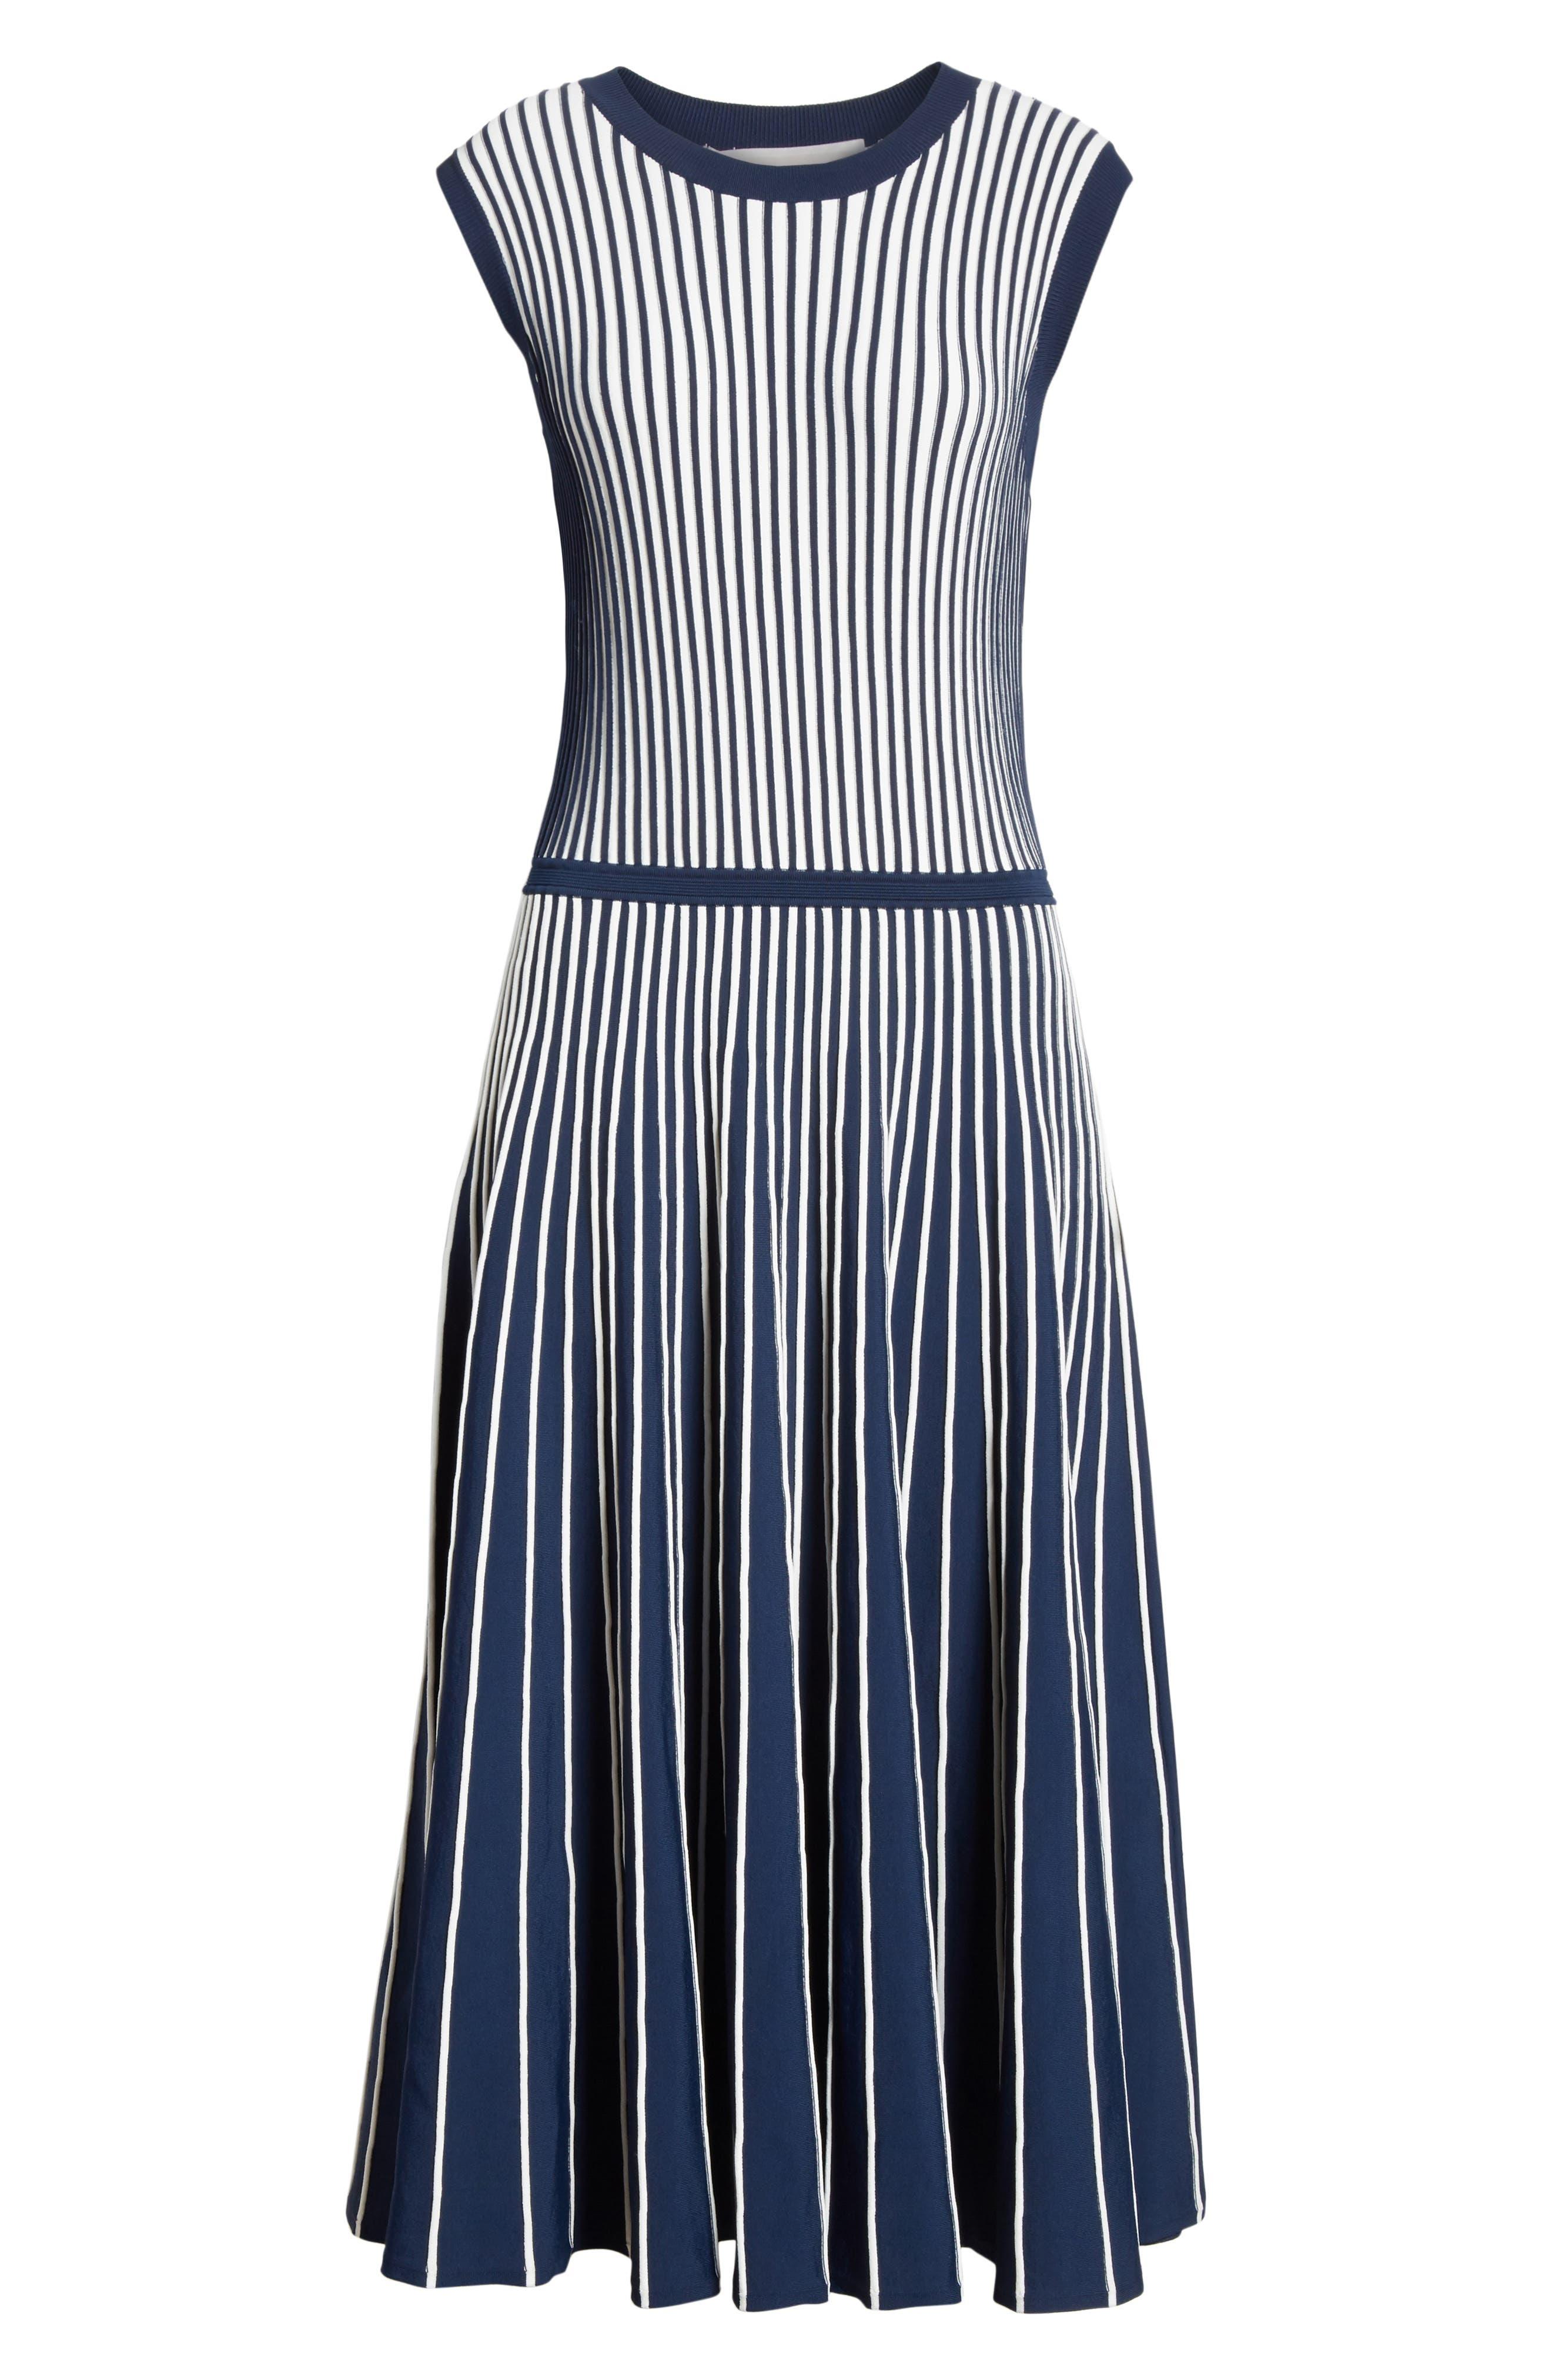 Stripe Knit Day Dress,                             Alternate thumbnail 7, color,                             Navy / Chalk